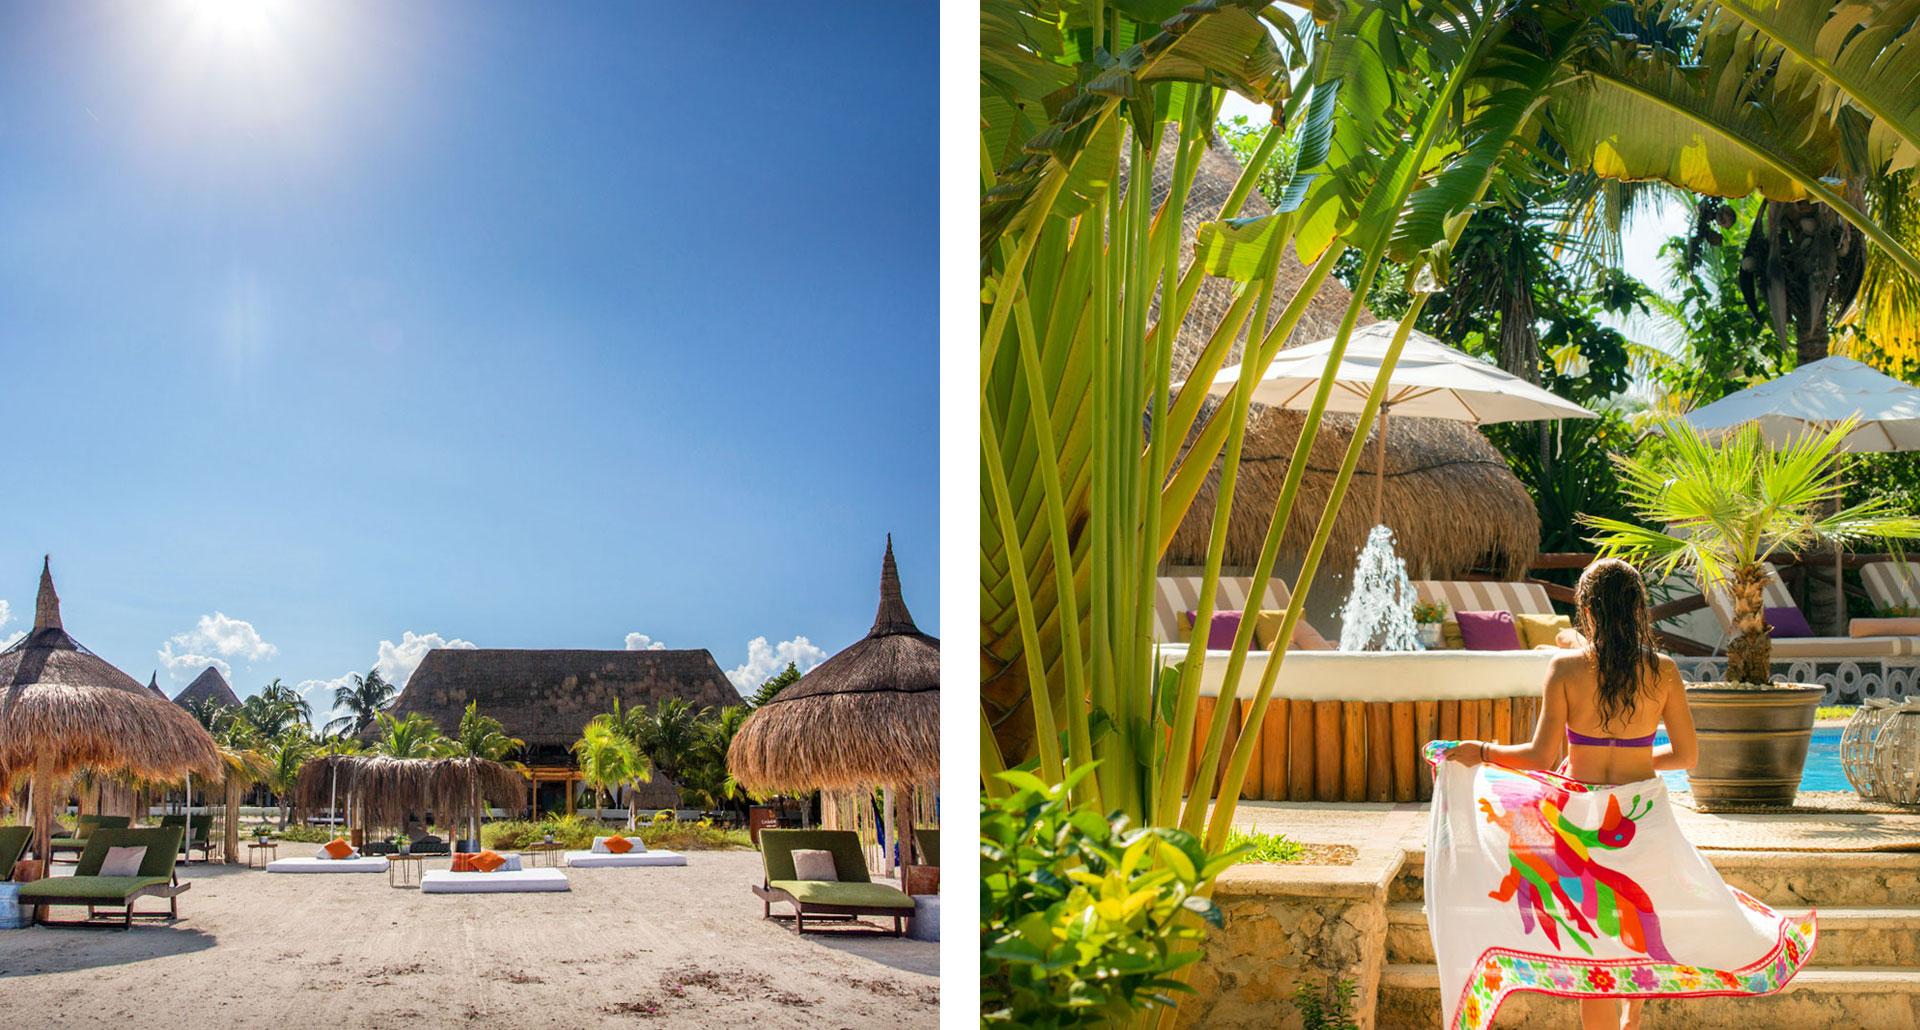 Boutique Hotel CasaSandra - boutique hotel in Isla Holbox